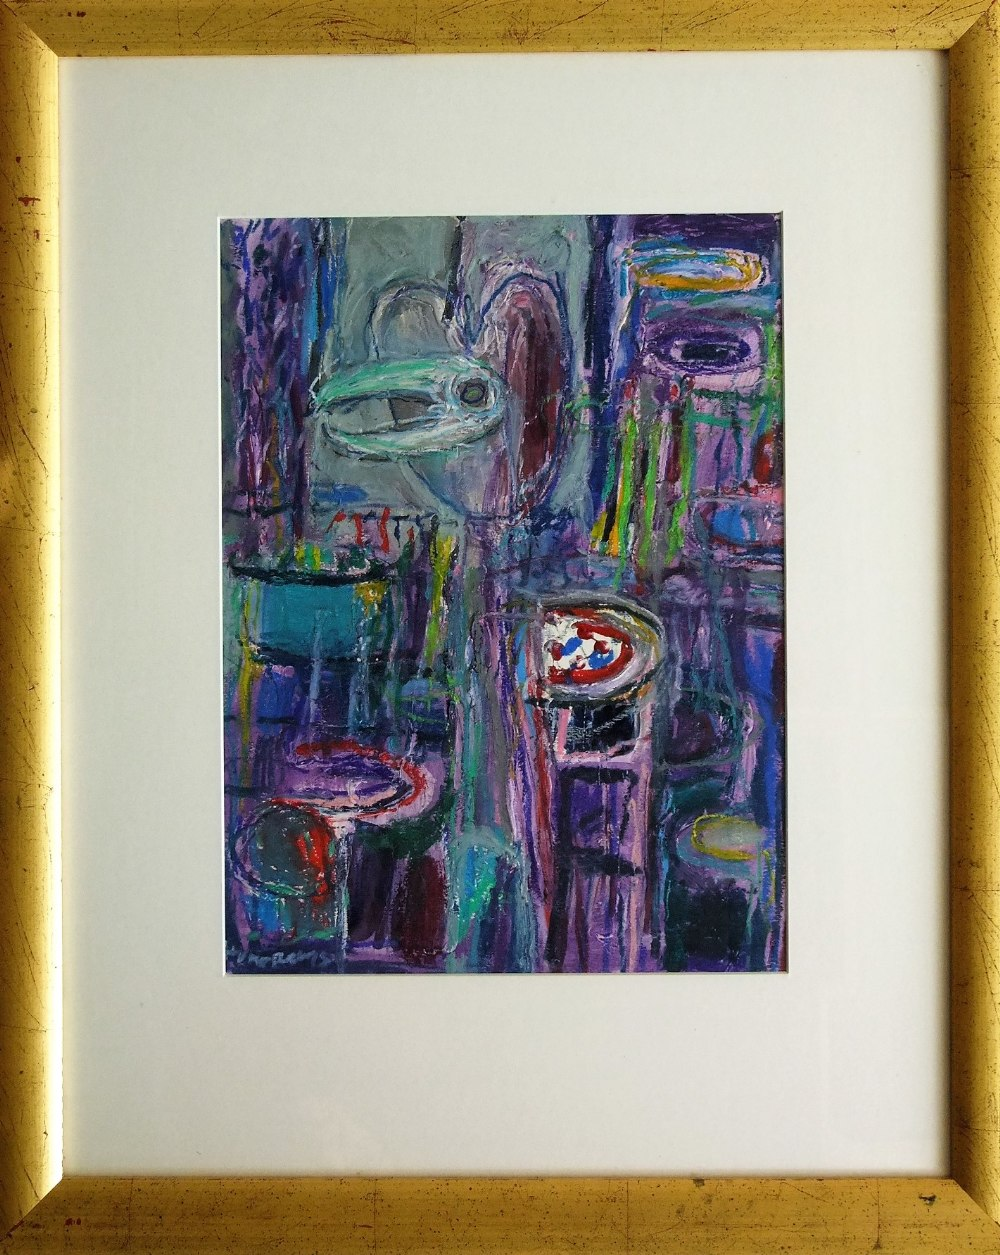 Lot 99 - Ian Humphreys (B.1956) - 'Visitation', signed, inscribed label dated 1992 verso, mixed media, 45 x